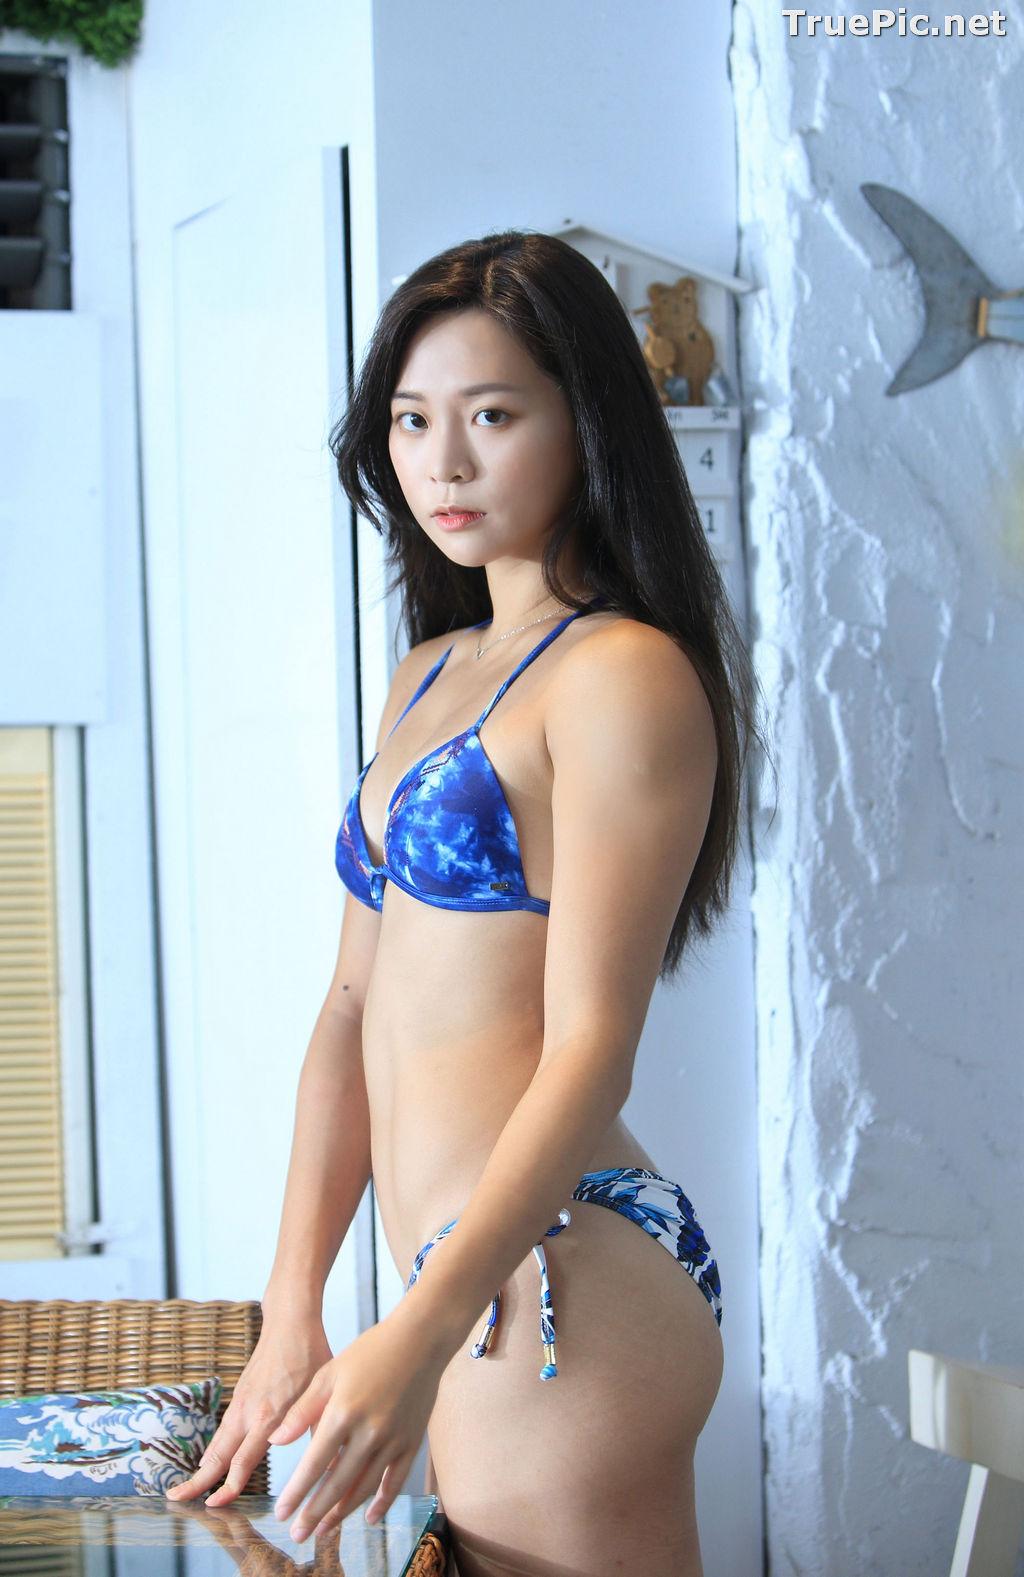 Image Taiwanese Model - Shelly - Beautiful Bodybuilding Bikini Girl - TruePic.net - Picture-62